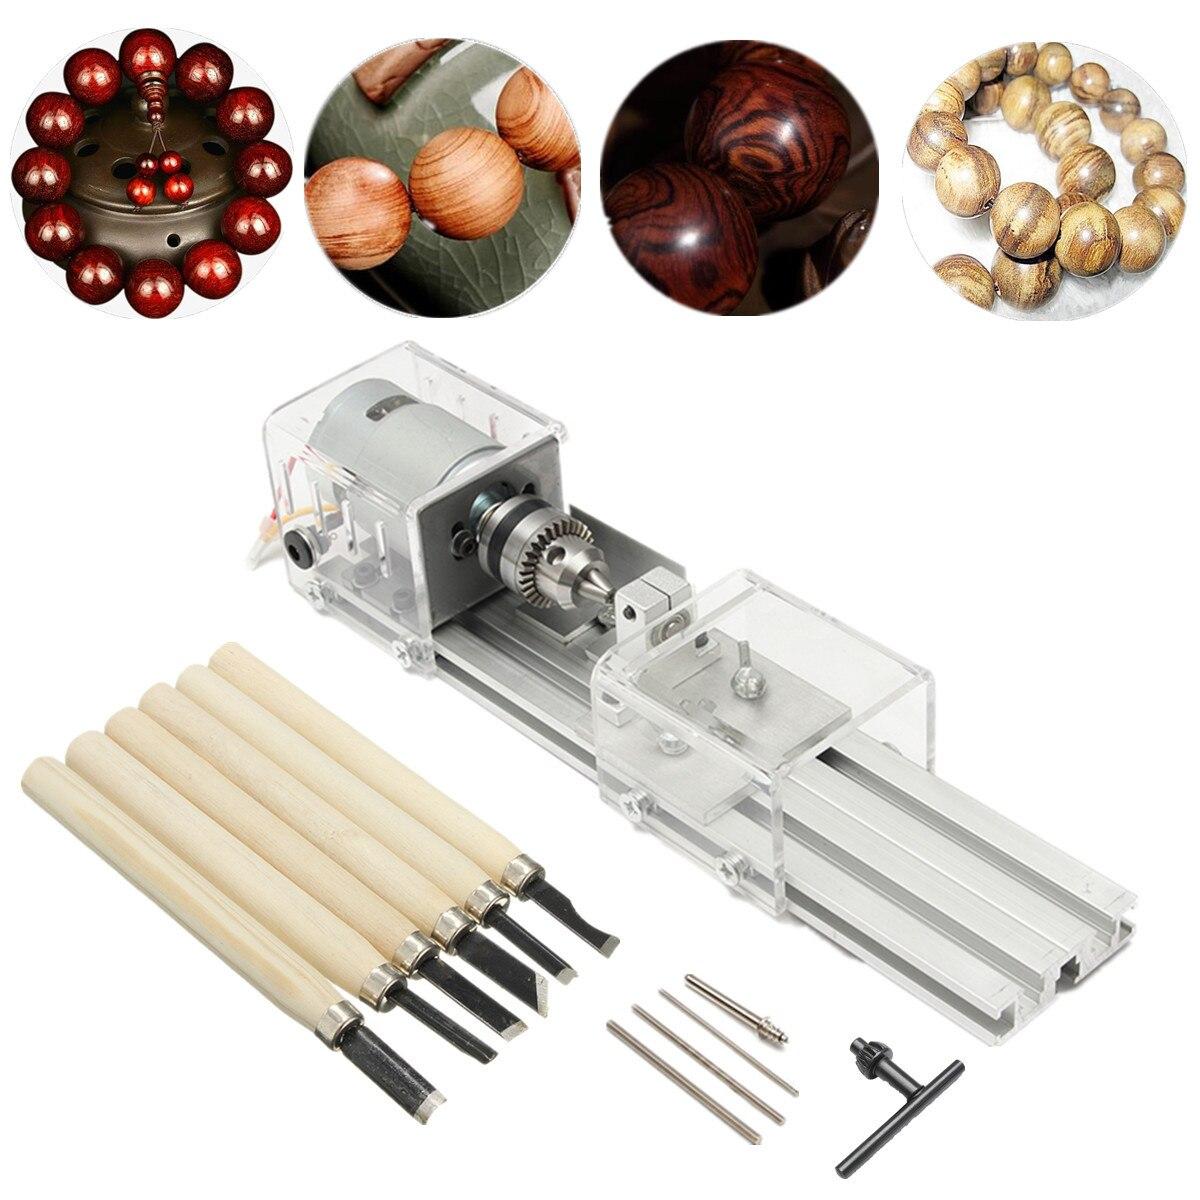 100W 24V Miniature Lathe Beads Polisher Machine DIY Lathe Machine Buddha Pearl Lathe Grinding and Polishing Beads Wood Working цены